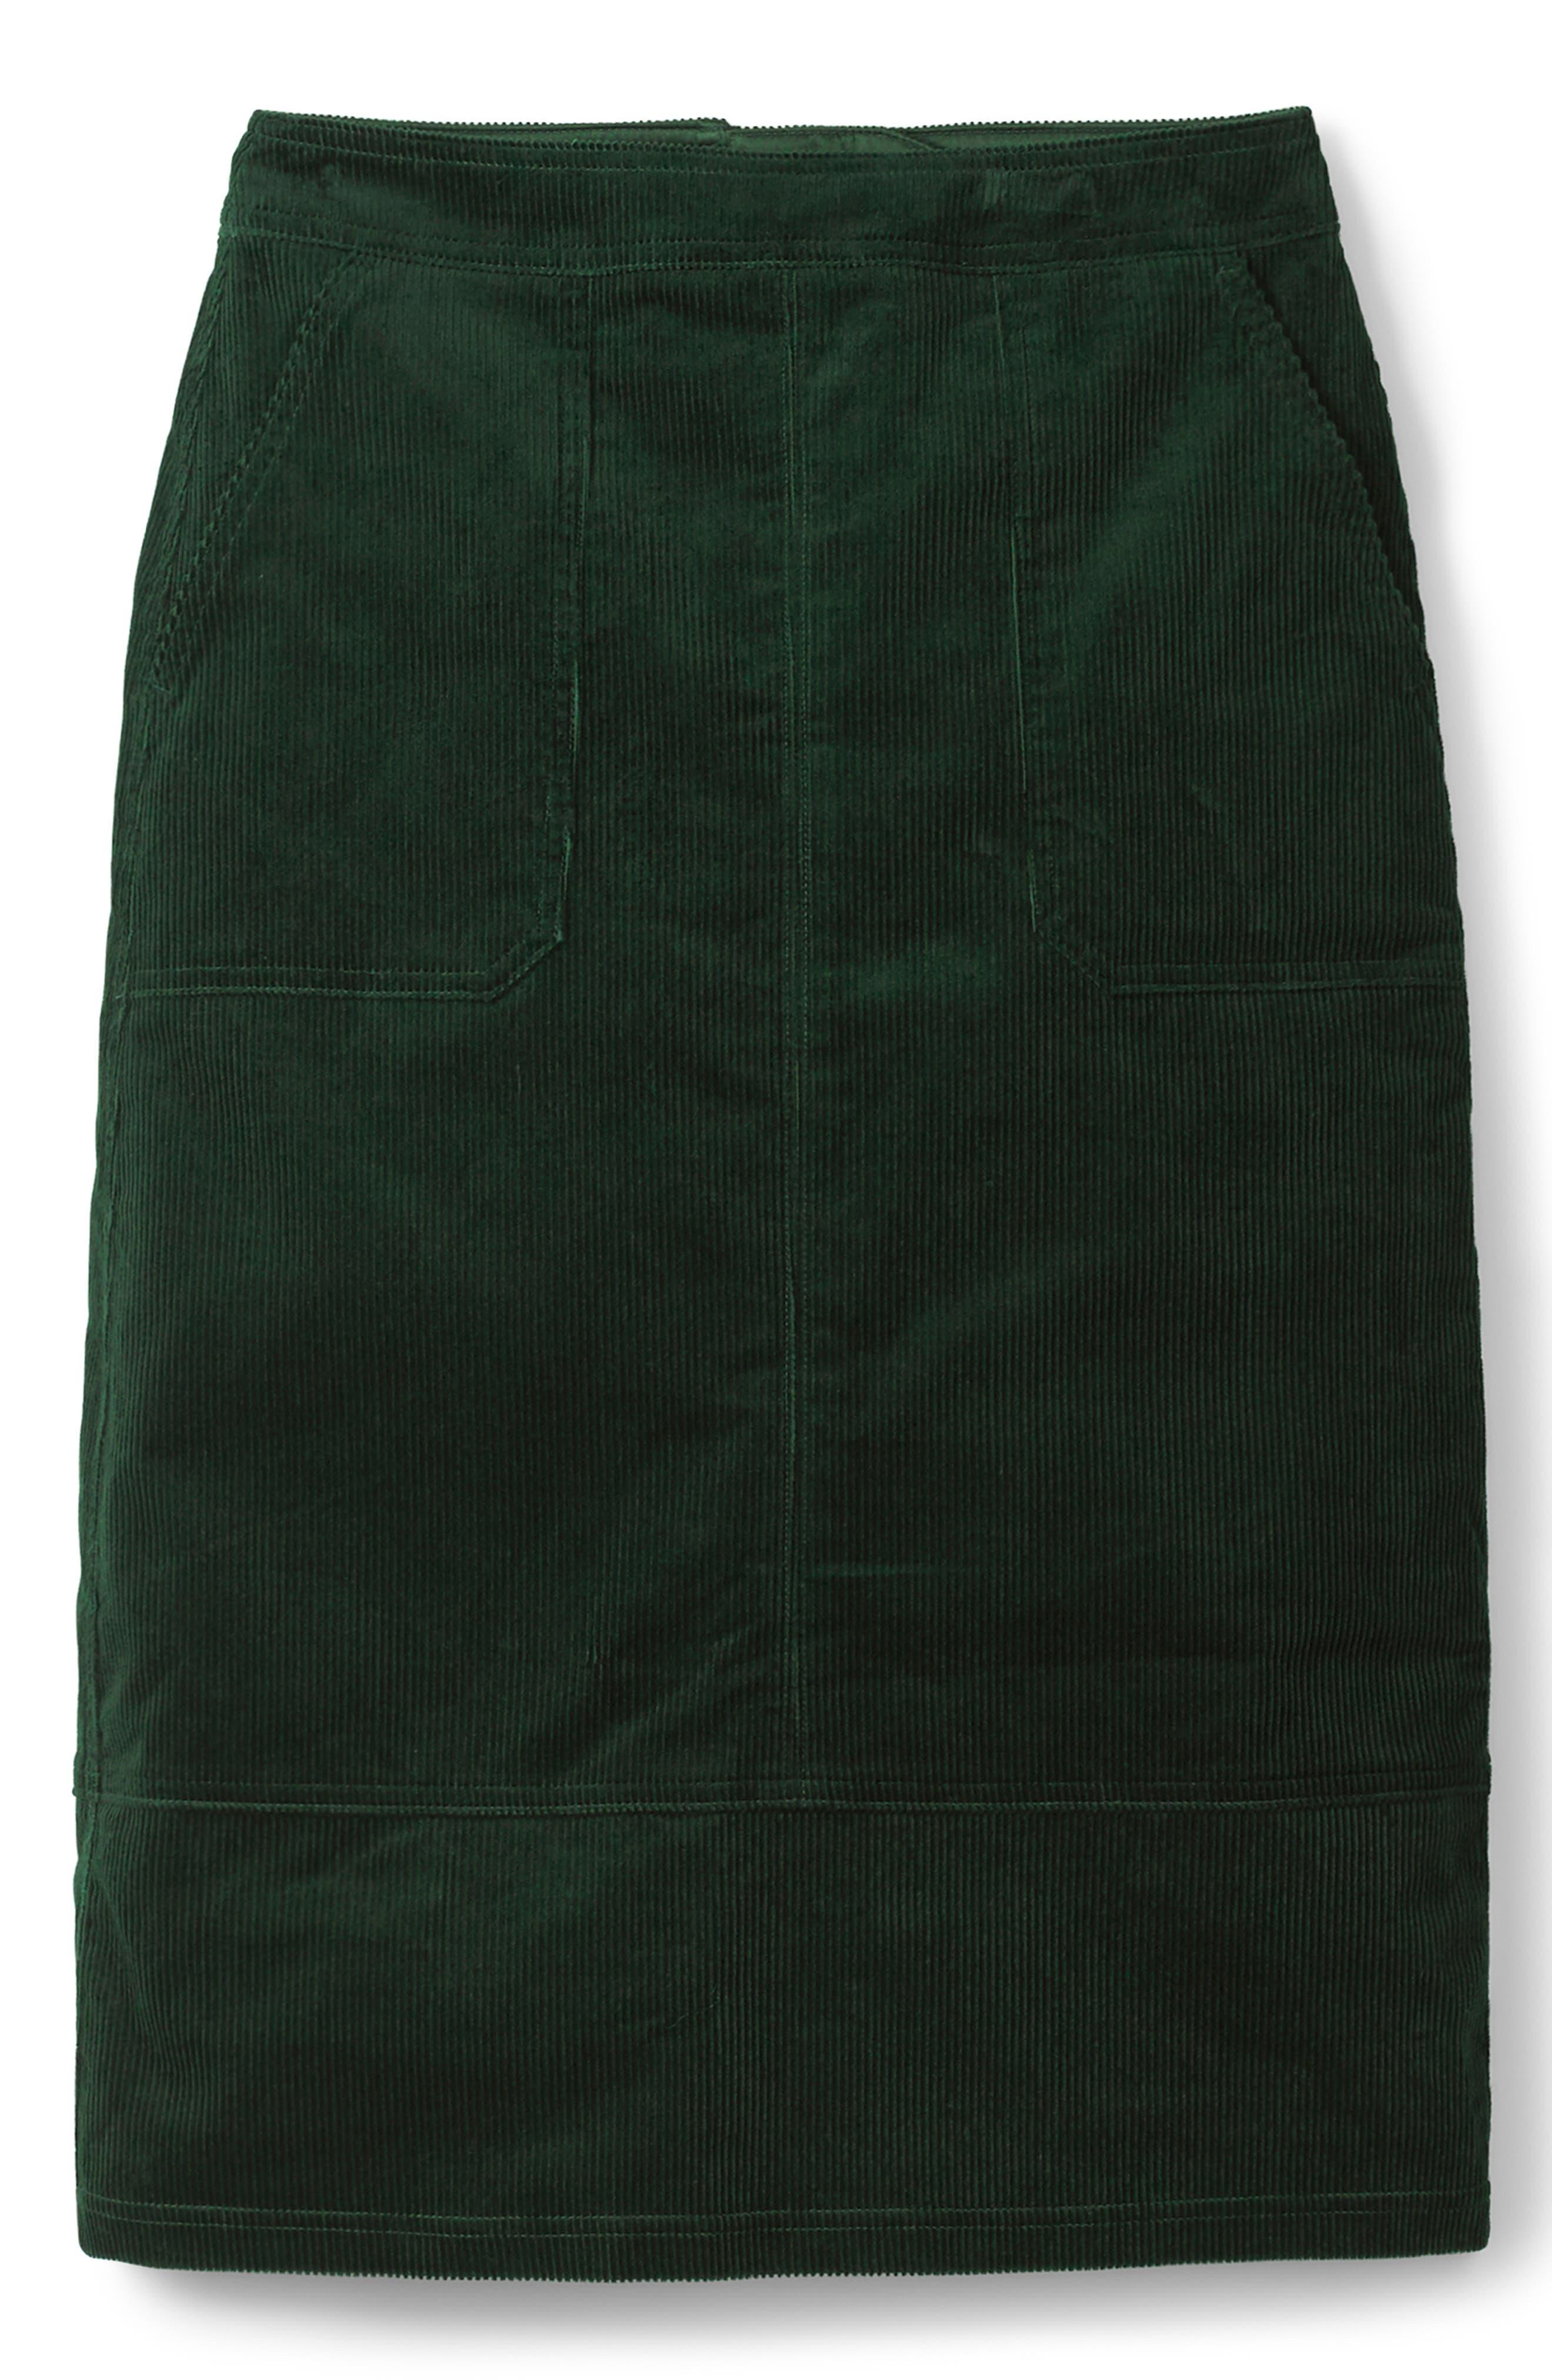 Patch Pocket Corduroy Midi Skirt,                             Alternate thumbnail 5, color,                             CHATSWORTH GREEN